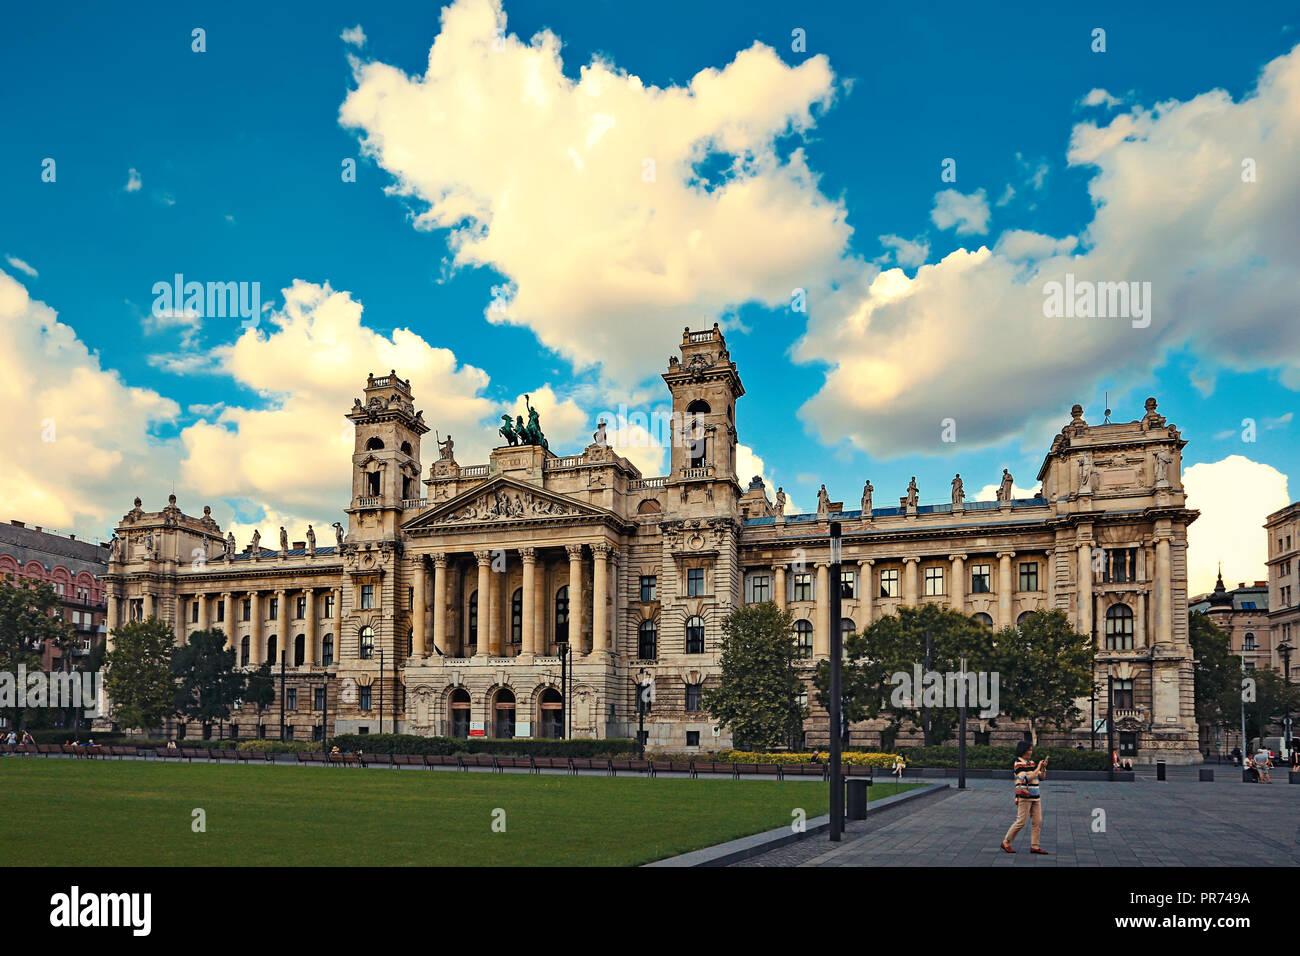 Hungarian National Museum of Ethnography, aka Neprajzi Muzeum, at Kossuth Lajos Square in Budapest, Hungary, Europe. Front view - Stock Image